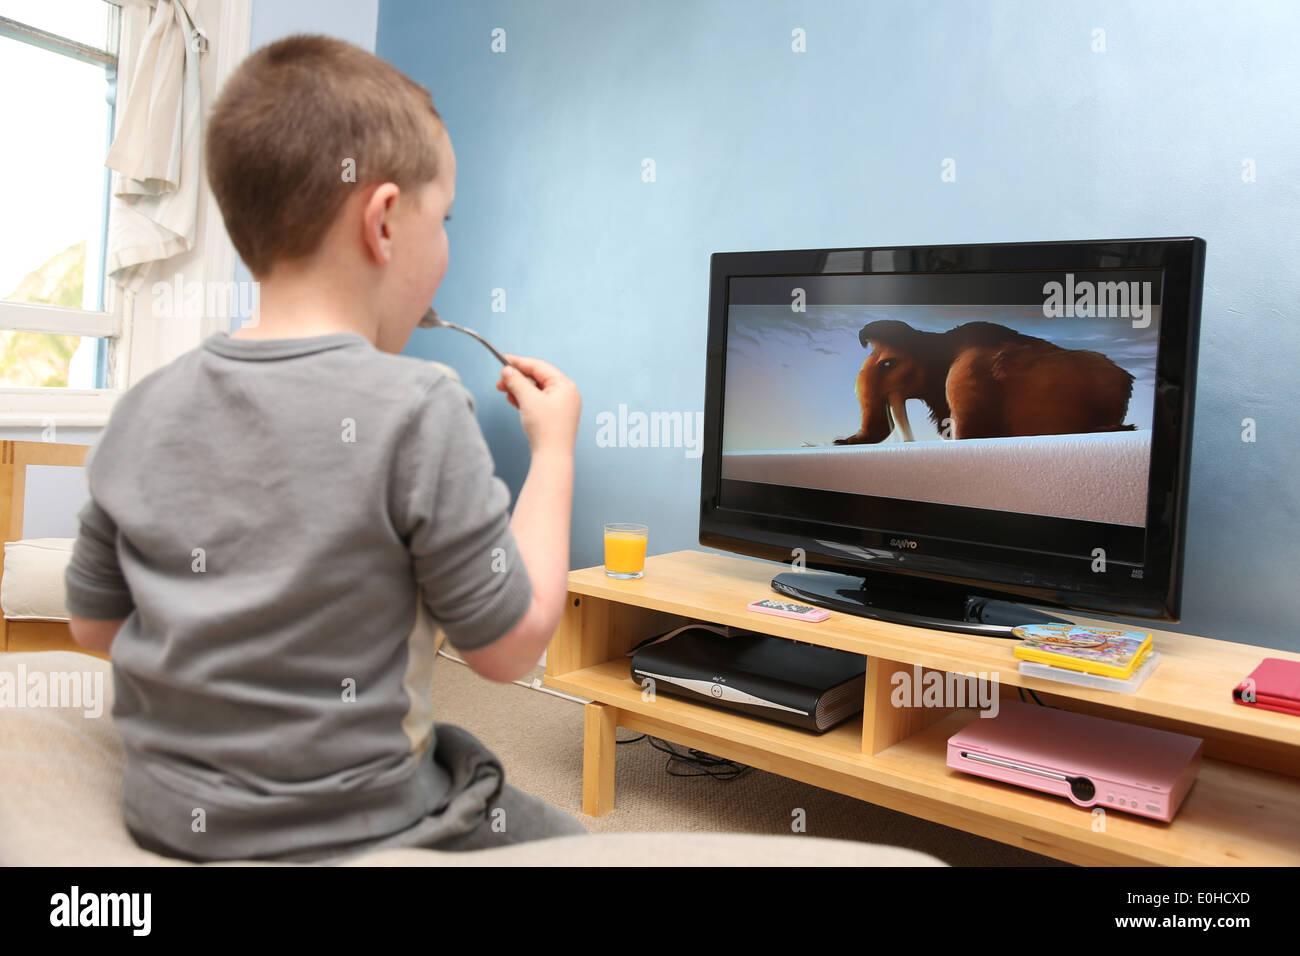 5 Year Old Boy Watching Tv Stock Photo Royalty Free Image